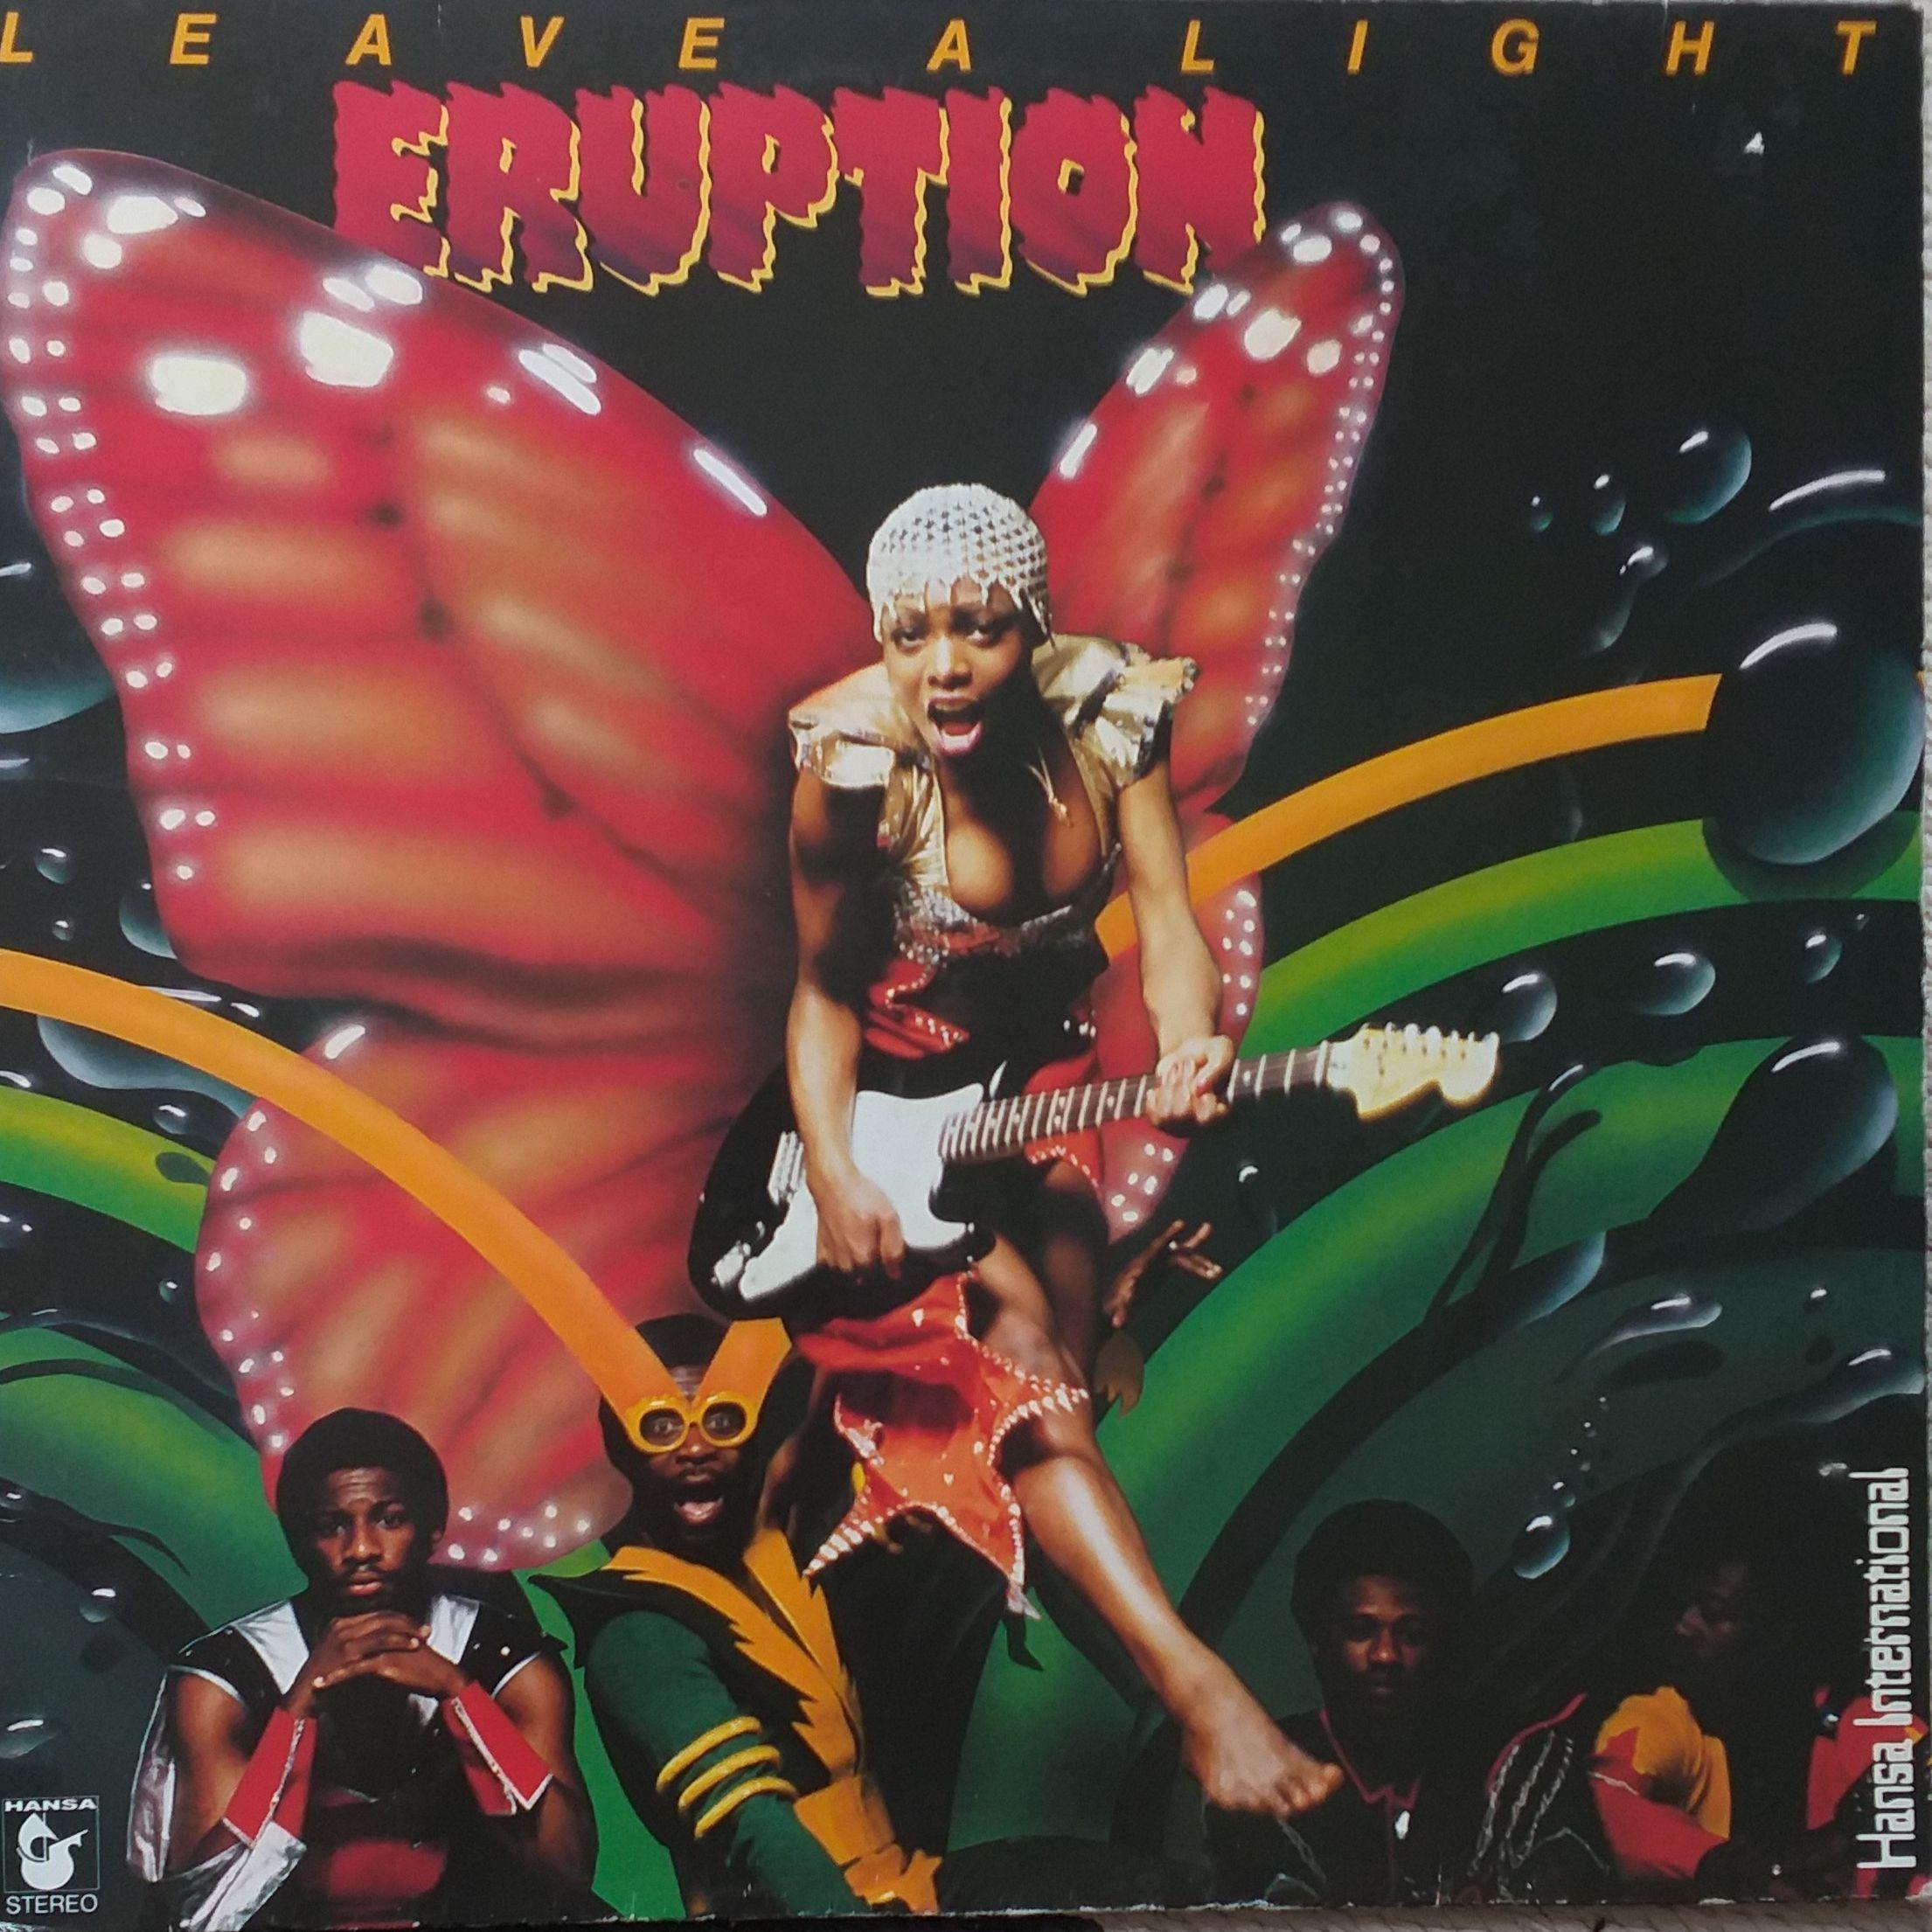 Eruption Leave a light LP undefined